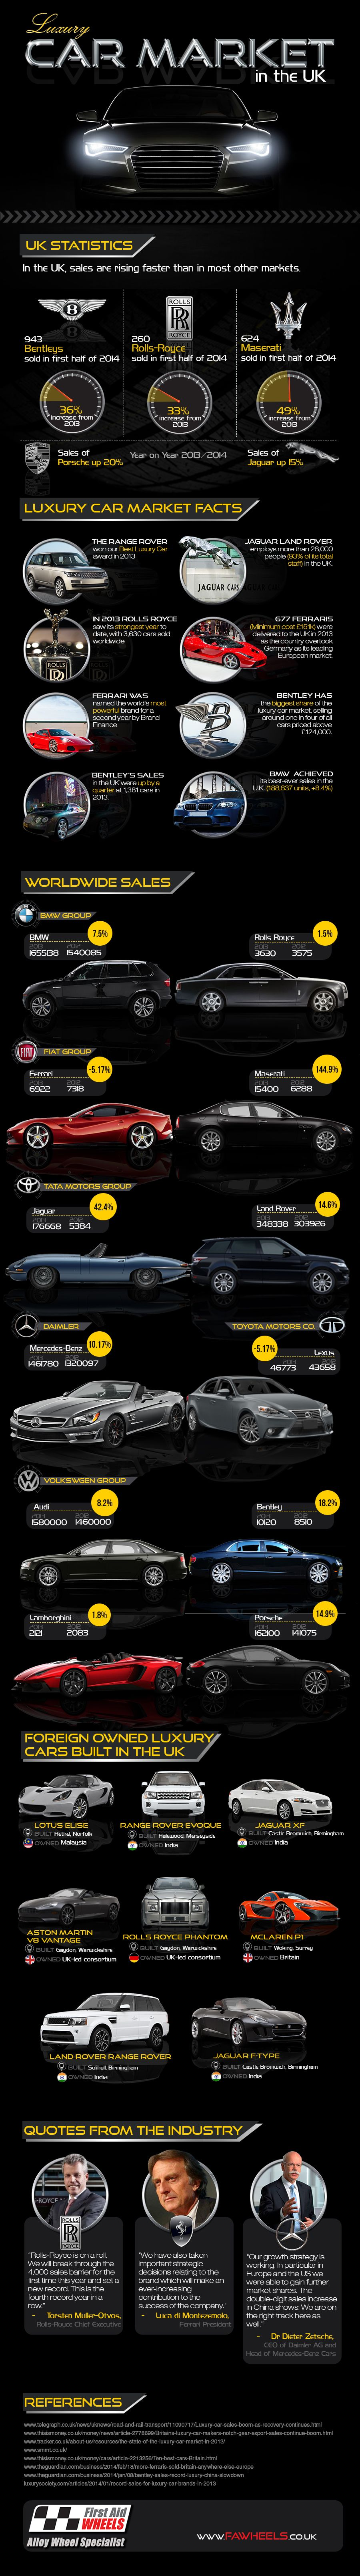 Luxury Car Market Growth In The Uk Infographic Luxury Automotive Luxury Cars